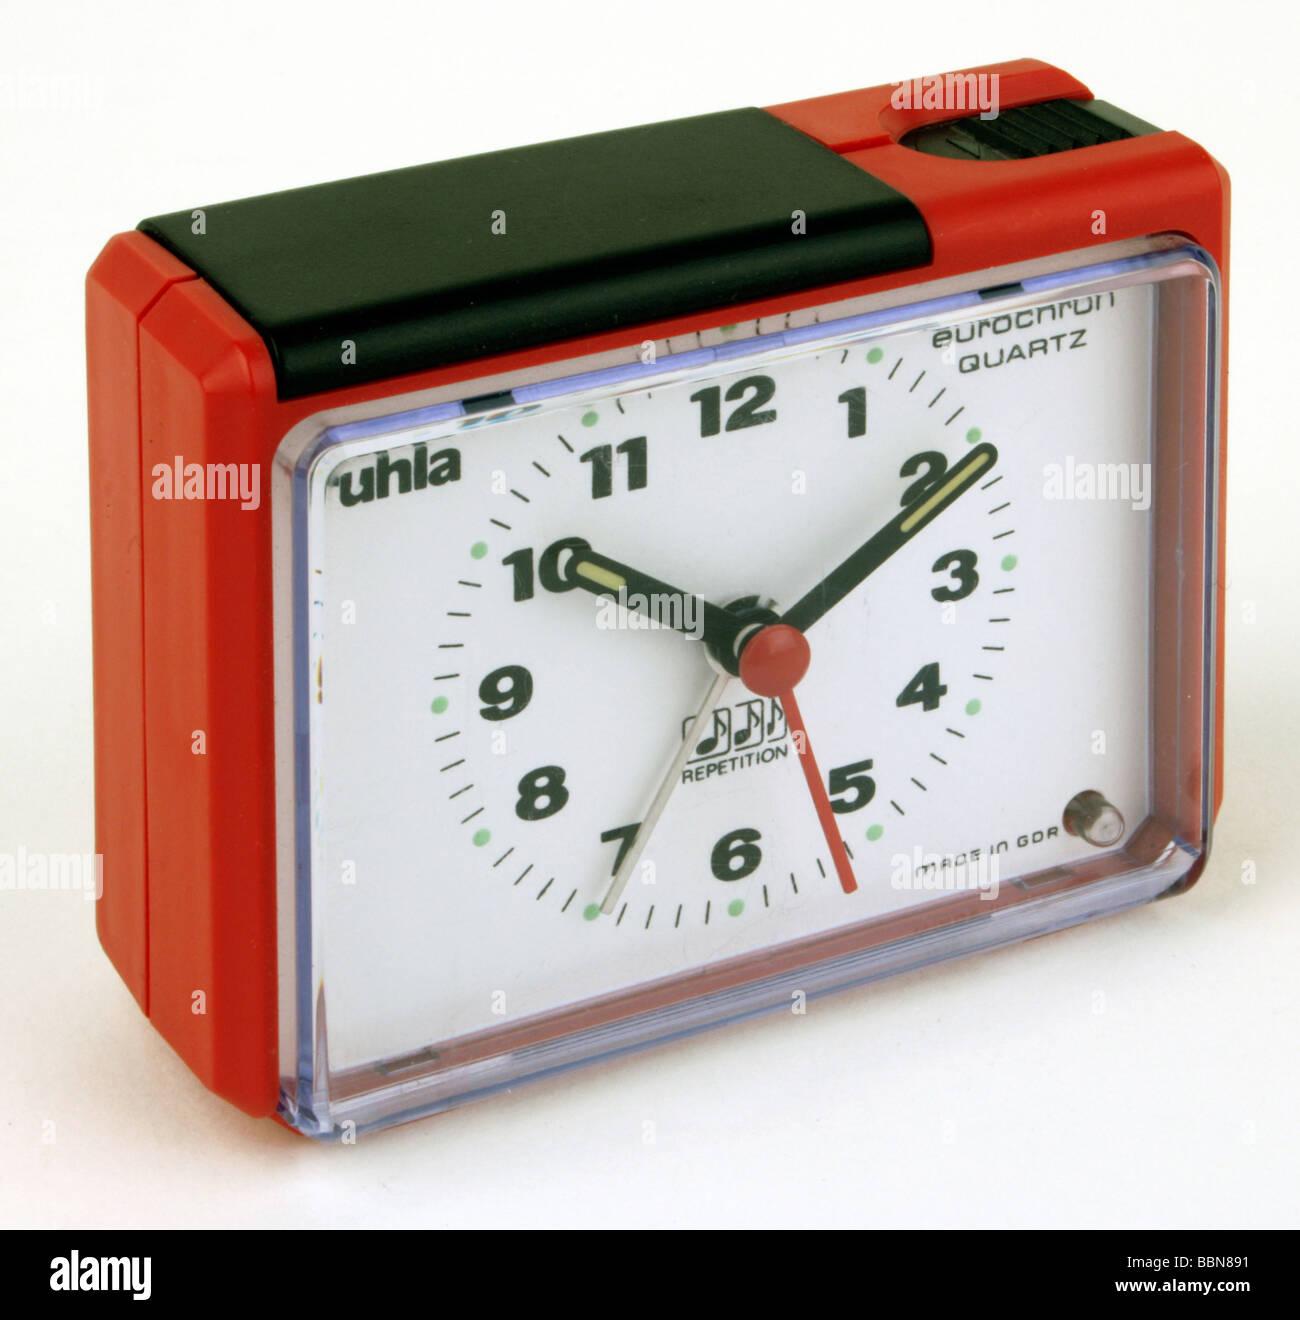 Ruhla-Eurochron horloges, réveil quartz, calibre 62-22, faite par Uhrenwerke VEB Ruhla, RDA, 1980 Additional Photo Stock